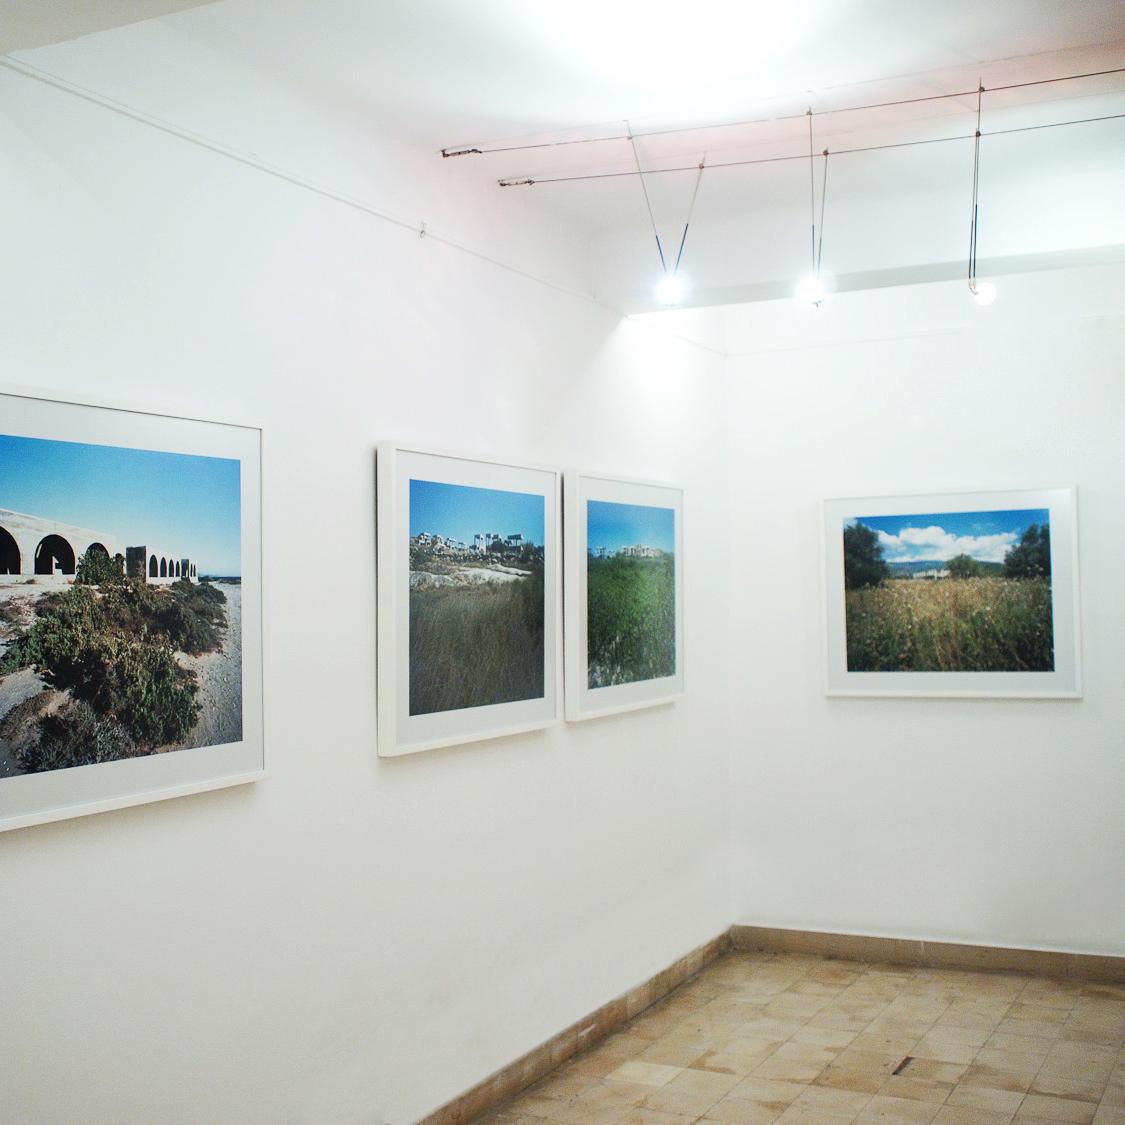 Dreams Abandoned at Athens Photo Festival 2011